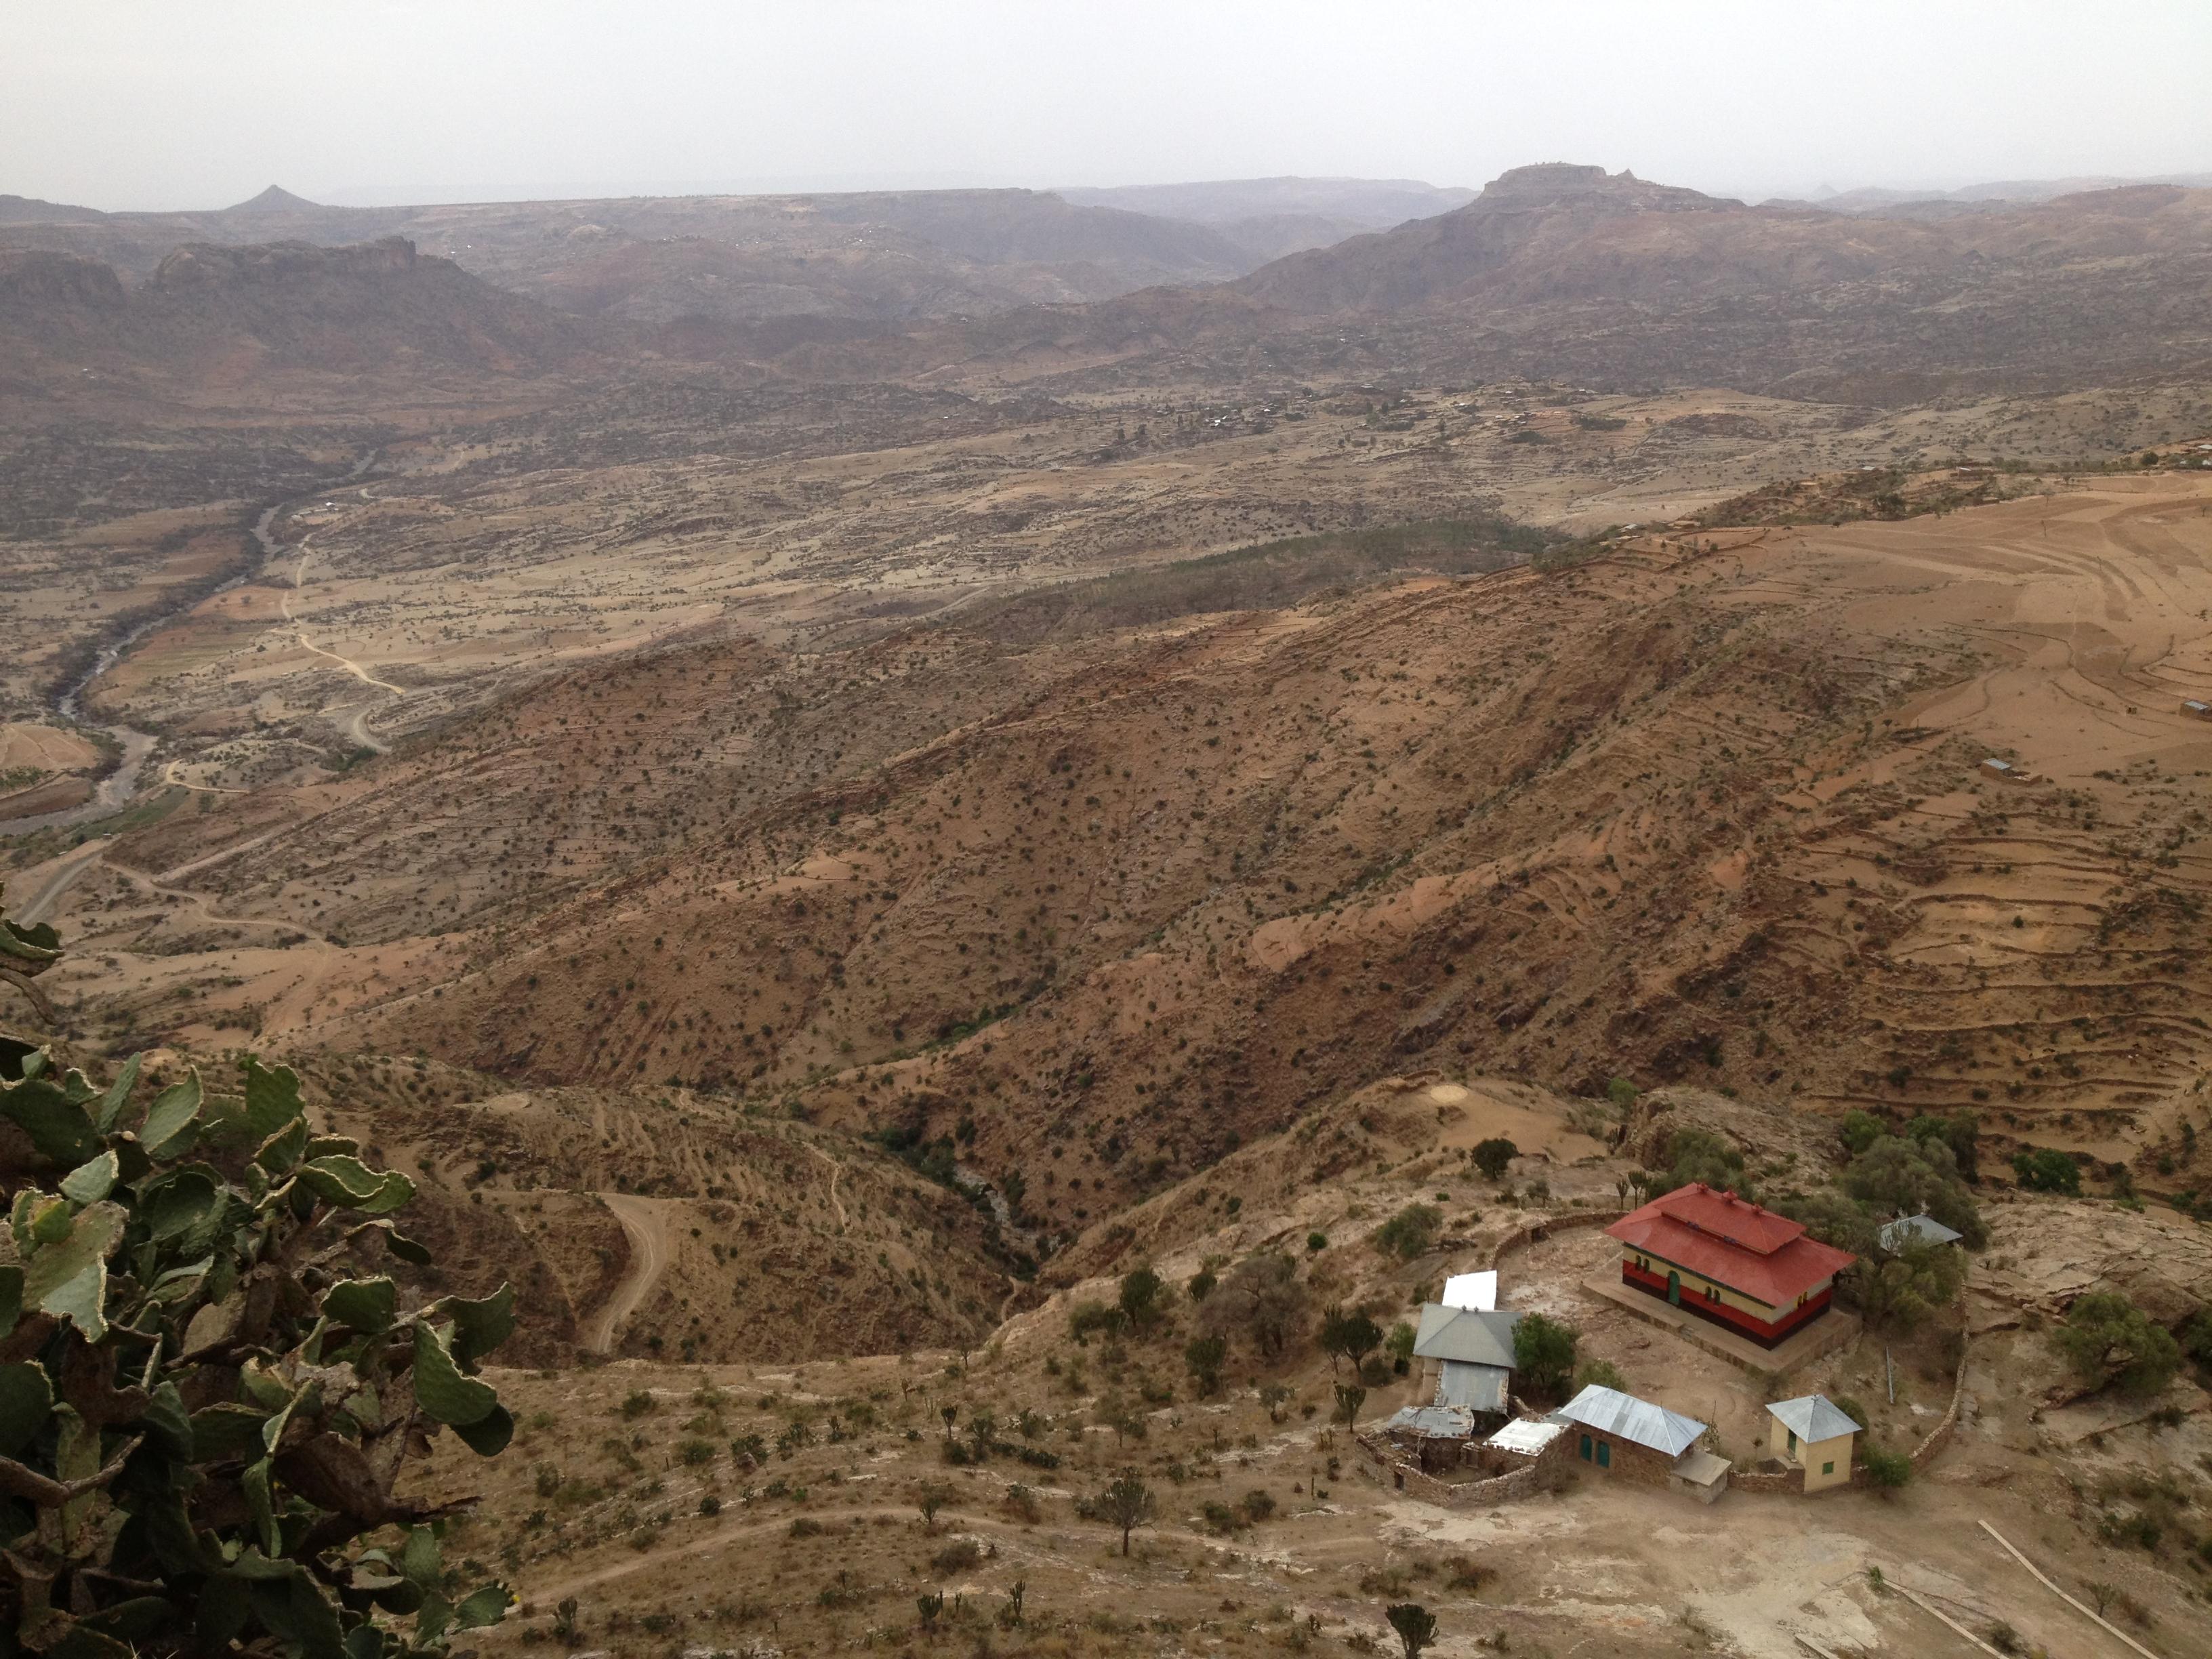 he view from the Monastery church Debre Damo